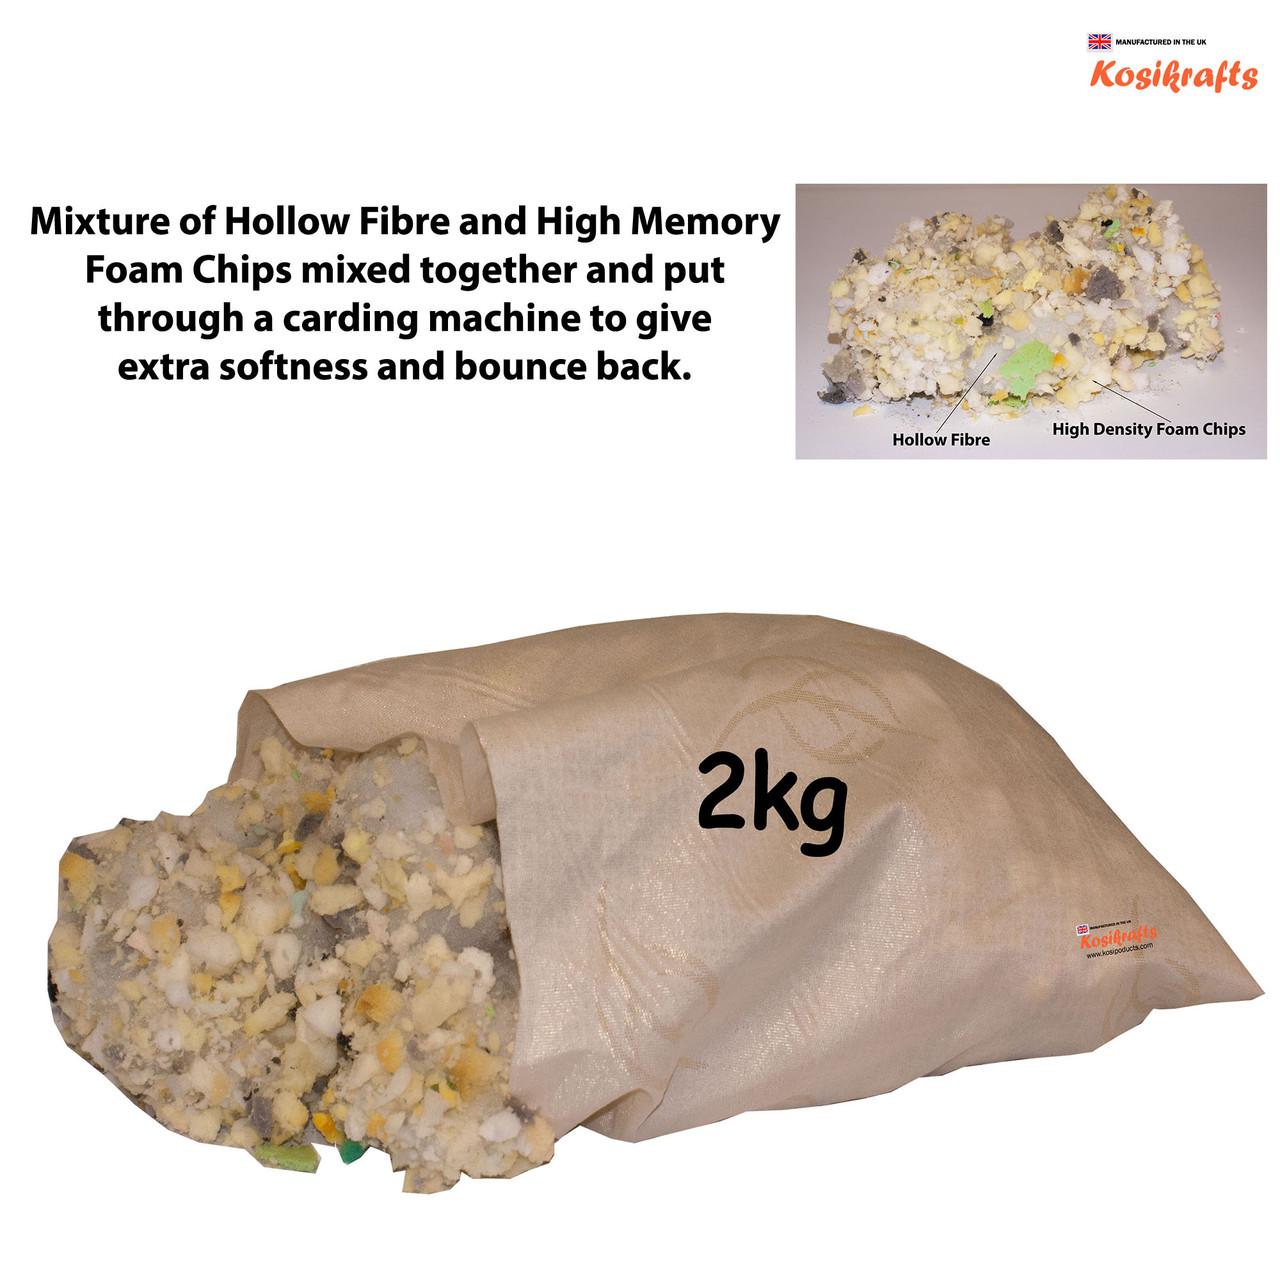 kosikrafts 2kg hollow fibre + Memory Foam mix cushion toy stuffing filling